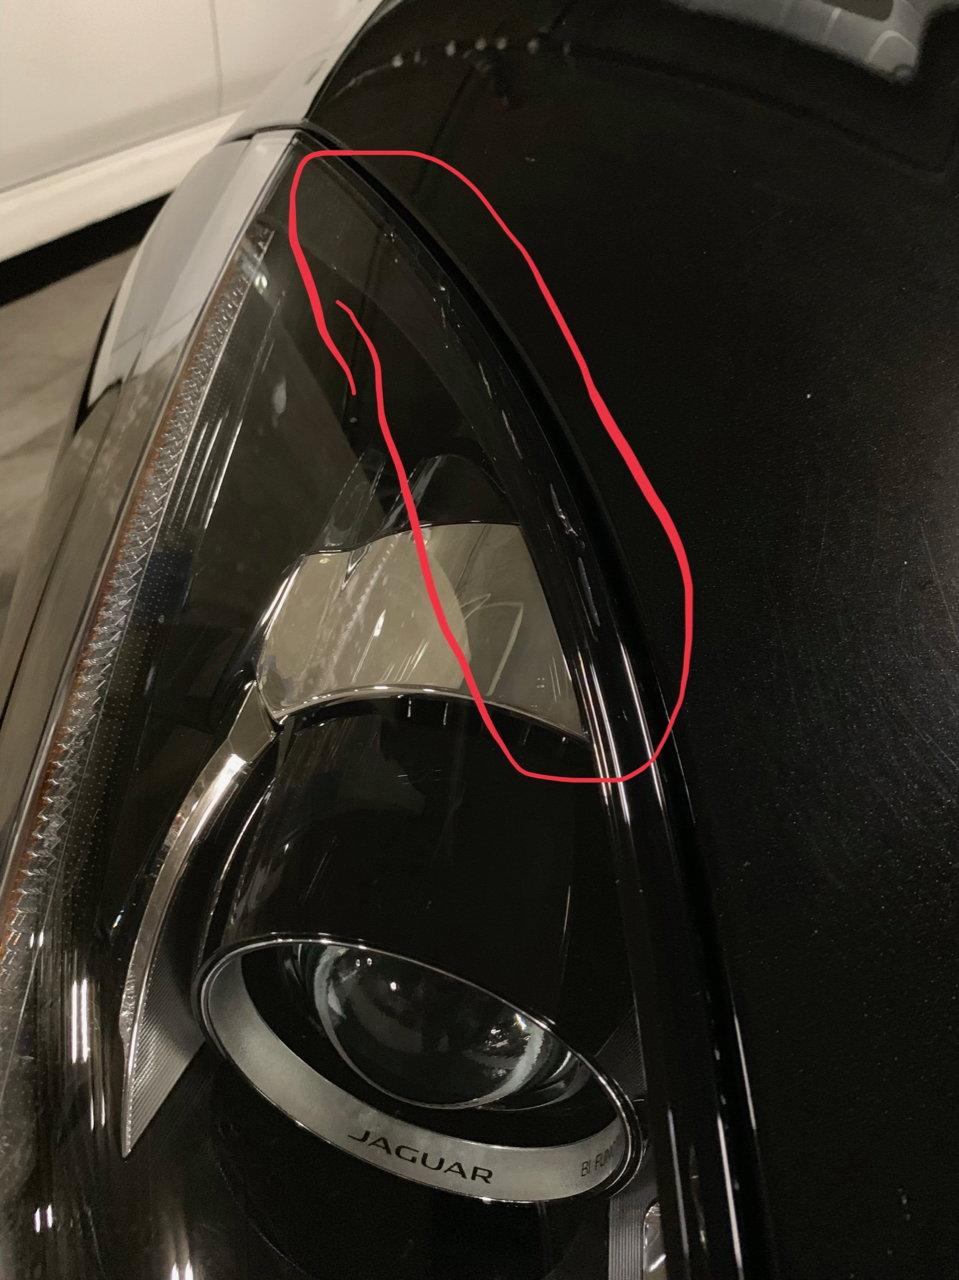 Cracks in headlights - Jaguar Forums - Jaguar Enthusiasts Forum